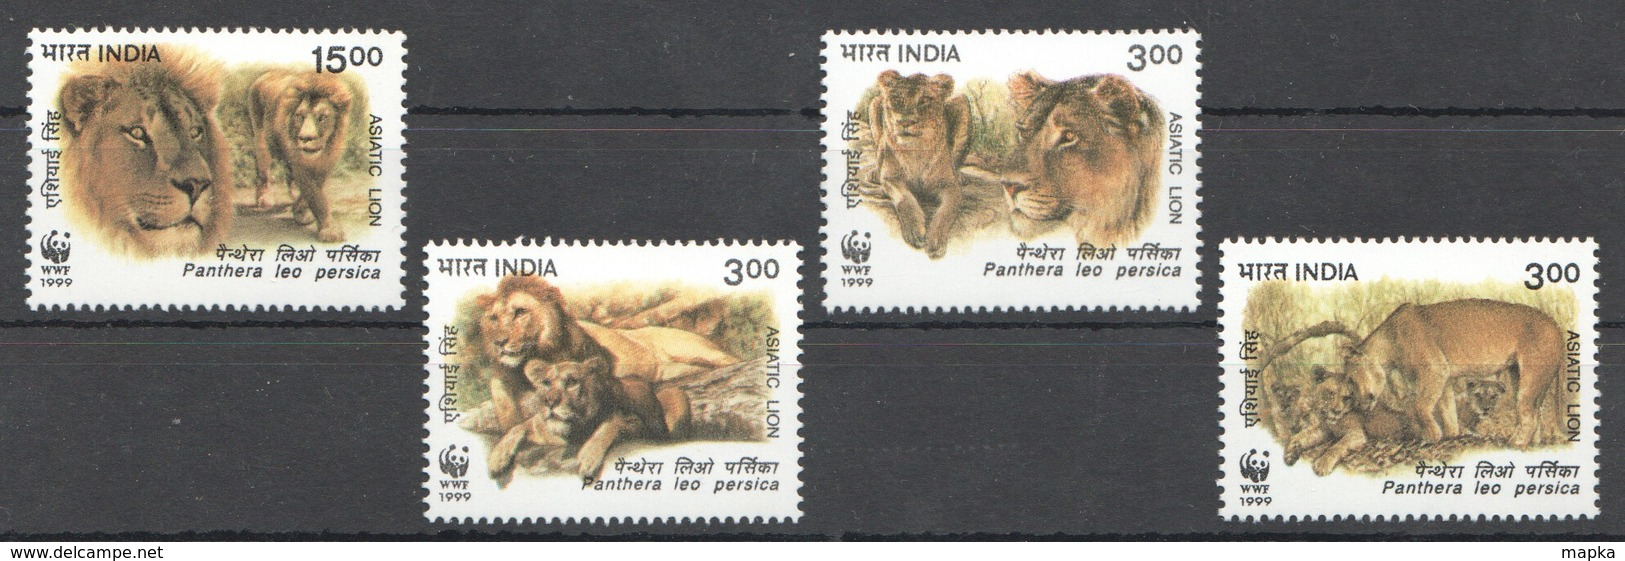 L615 1999 INDIA WWF FAUNA WILD ANIMALS ASIATIC LIONS 1SET MNH - W.W.F.